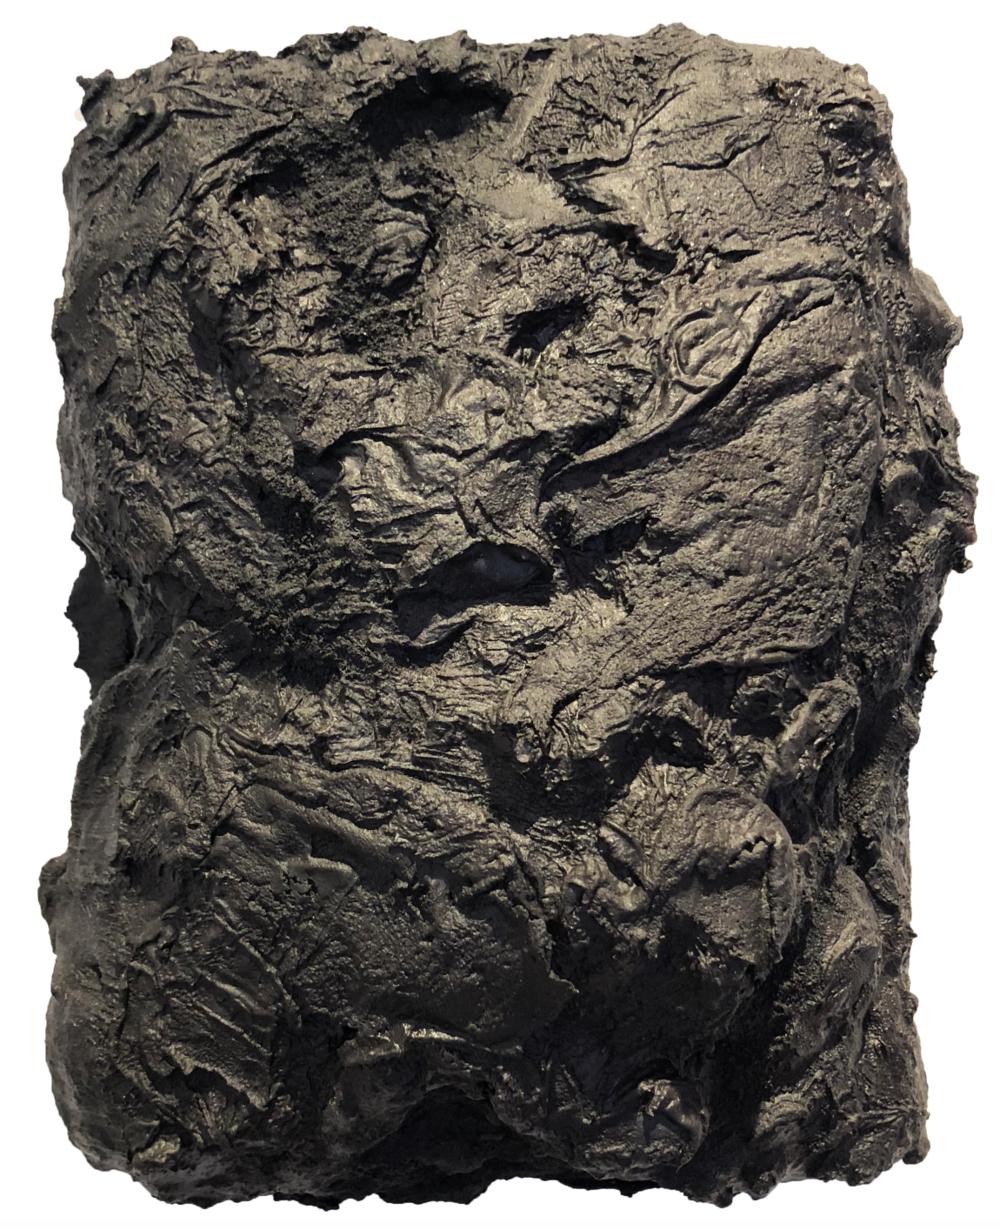 Matthew C. Metzger, Untitled  Iron, Oil, Isocyanate, Polyol Resin, 10x7 in.